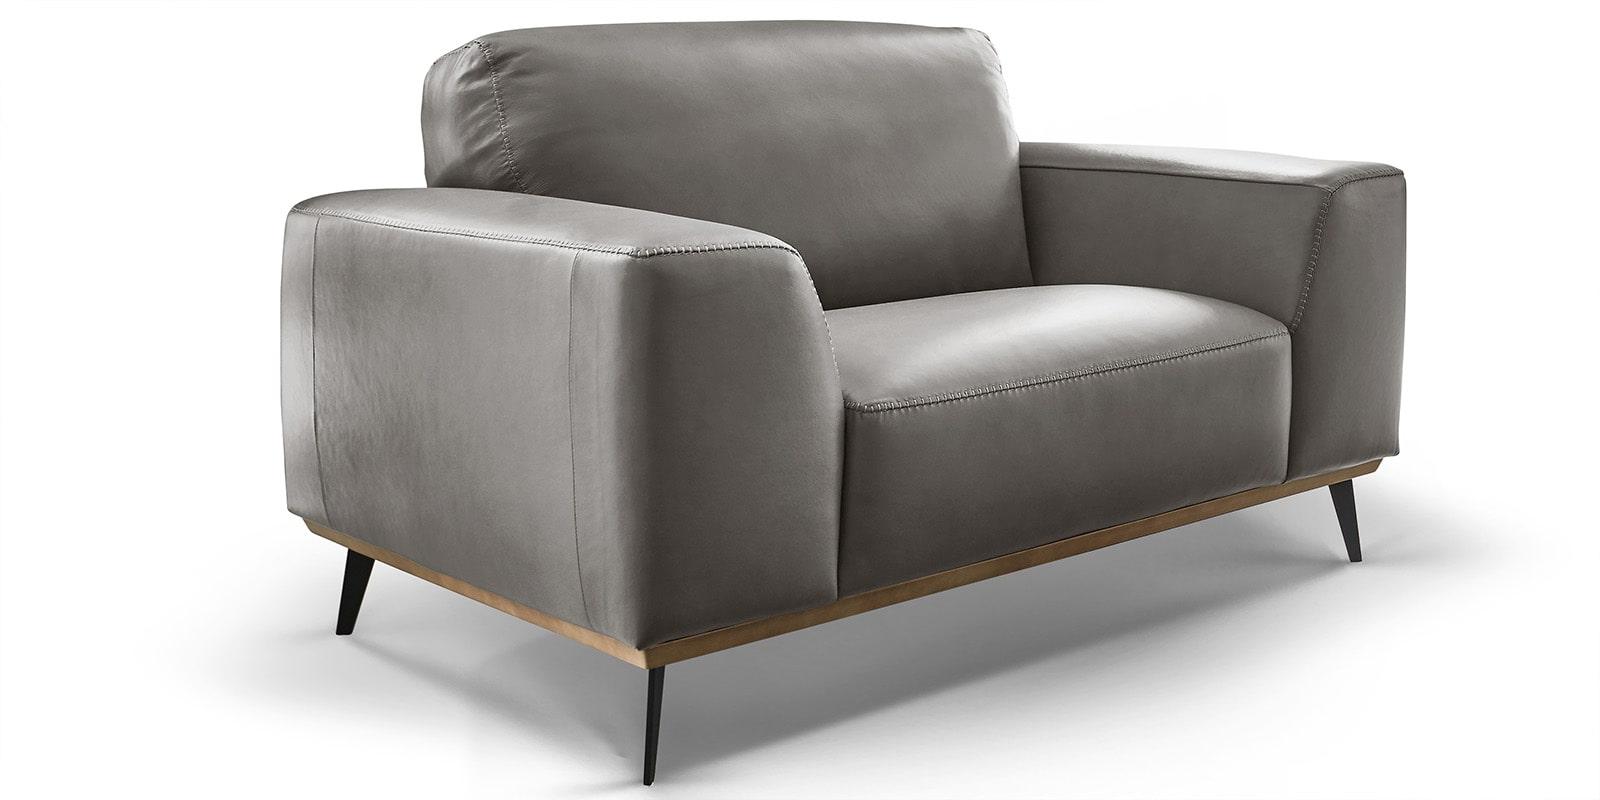 Moebella24 - 1,5-Sitzer - Sessel - Sofa - Barcelona - Leder - Grau - Skandinavisches - Design - Punto - cavallo - Nähte - Elegante - Füße - Detailaufnahme